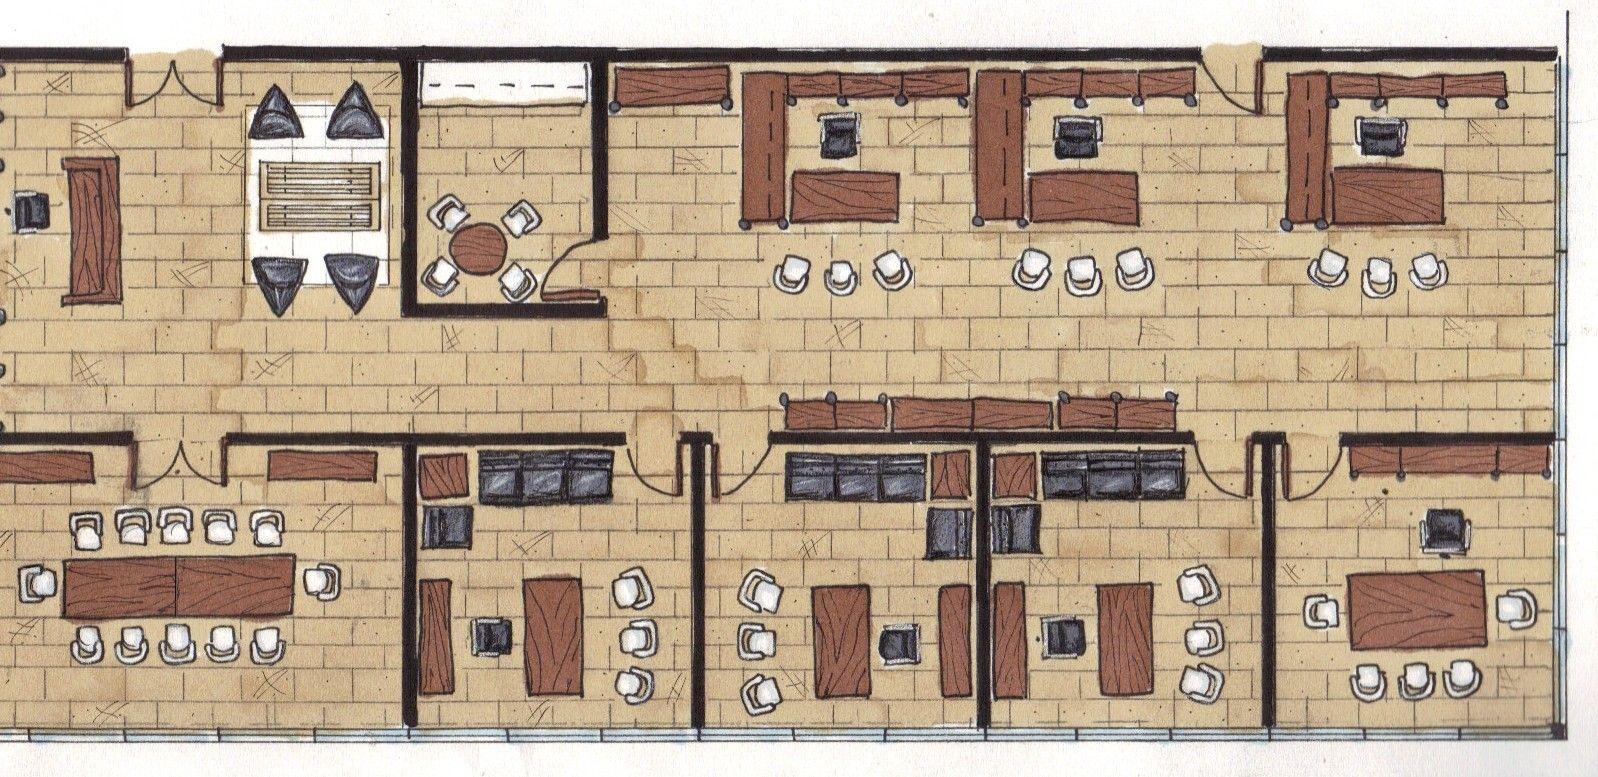 Law Office Floor Plan: Pin By Jami Bacon On Studio3